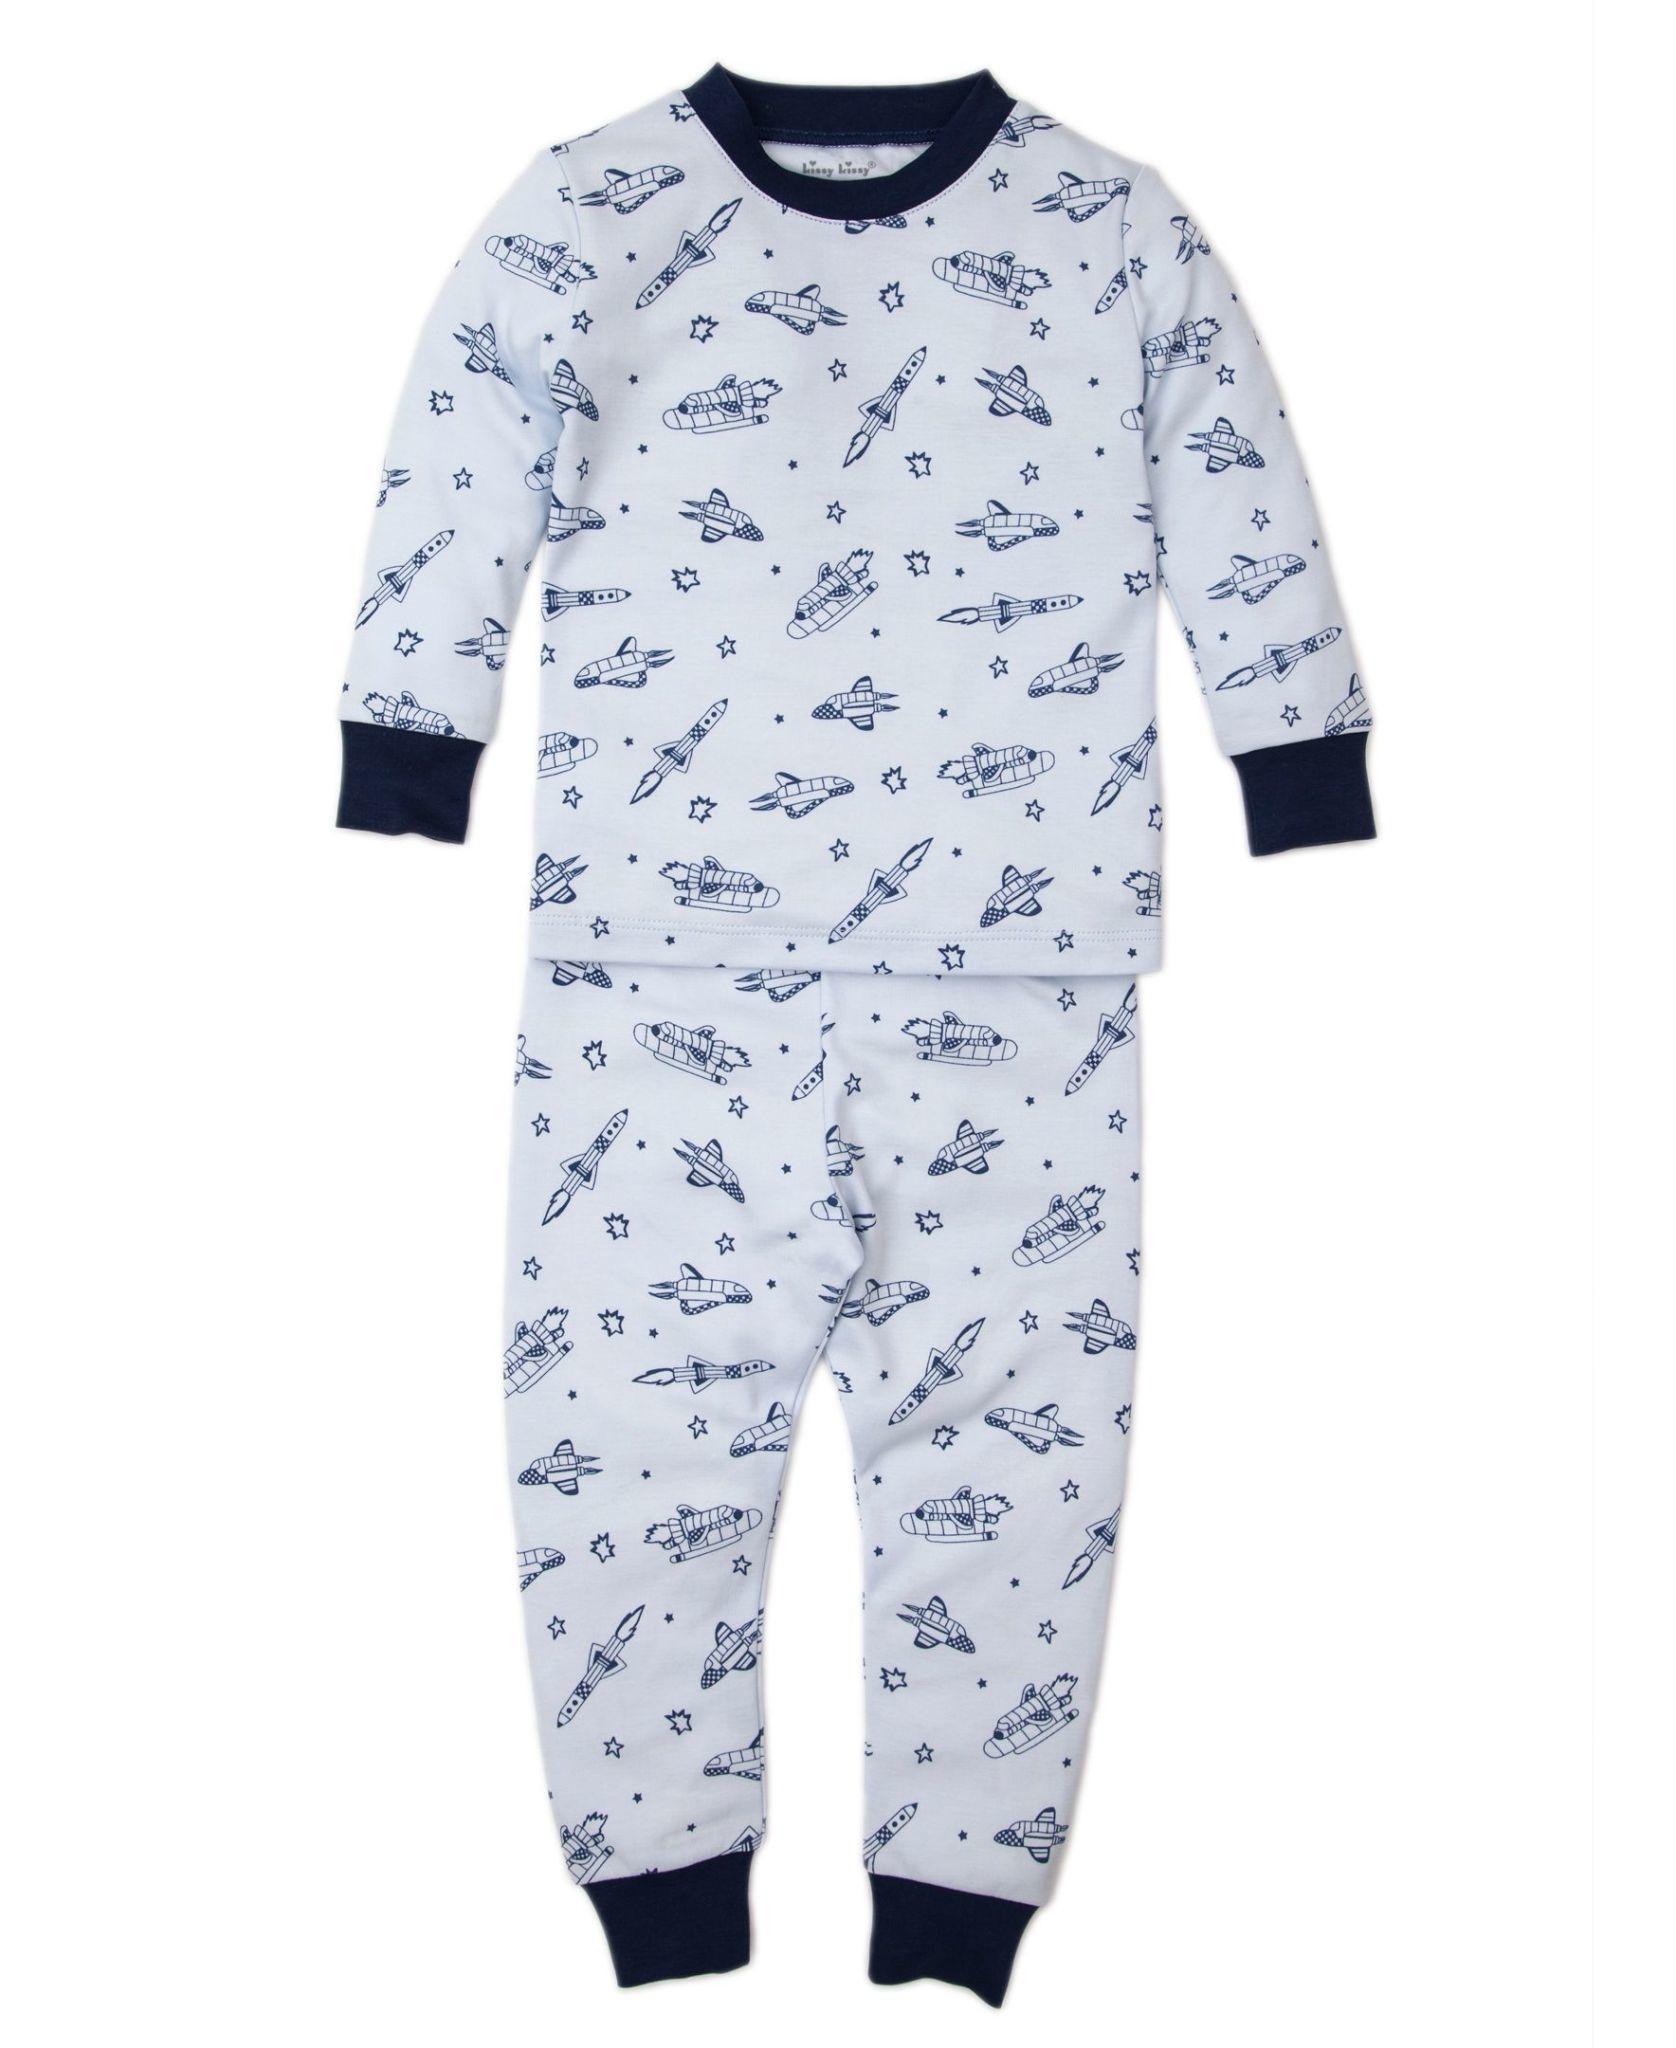 Kissy Kissy Spaceships Toddler Pajama